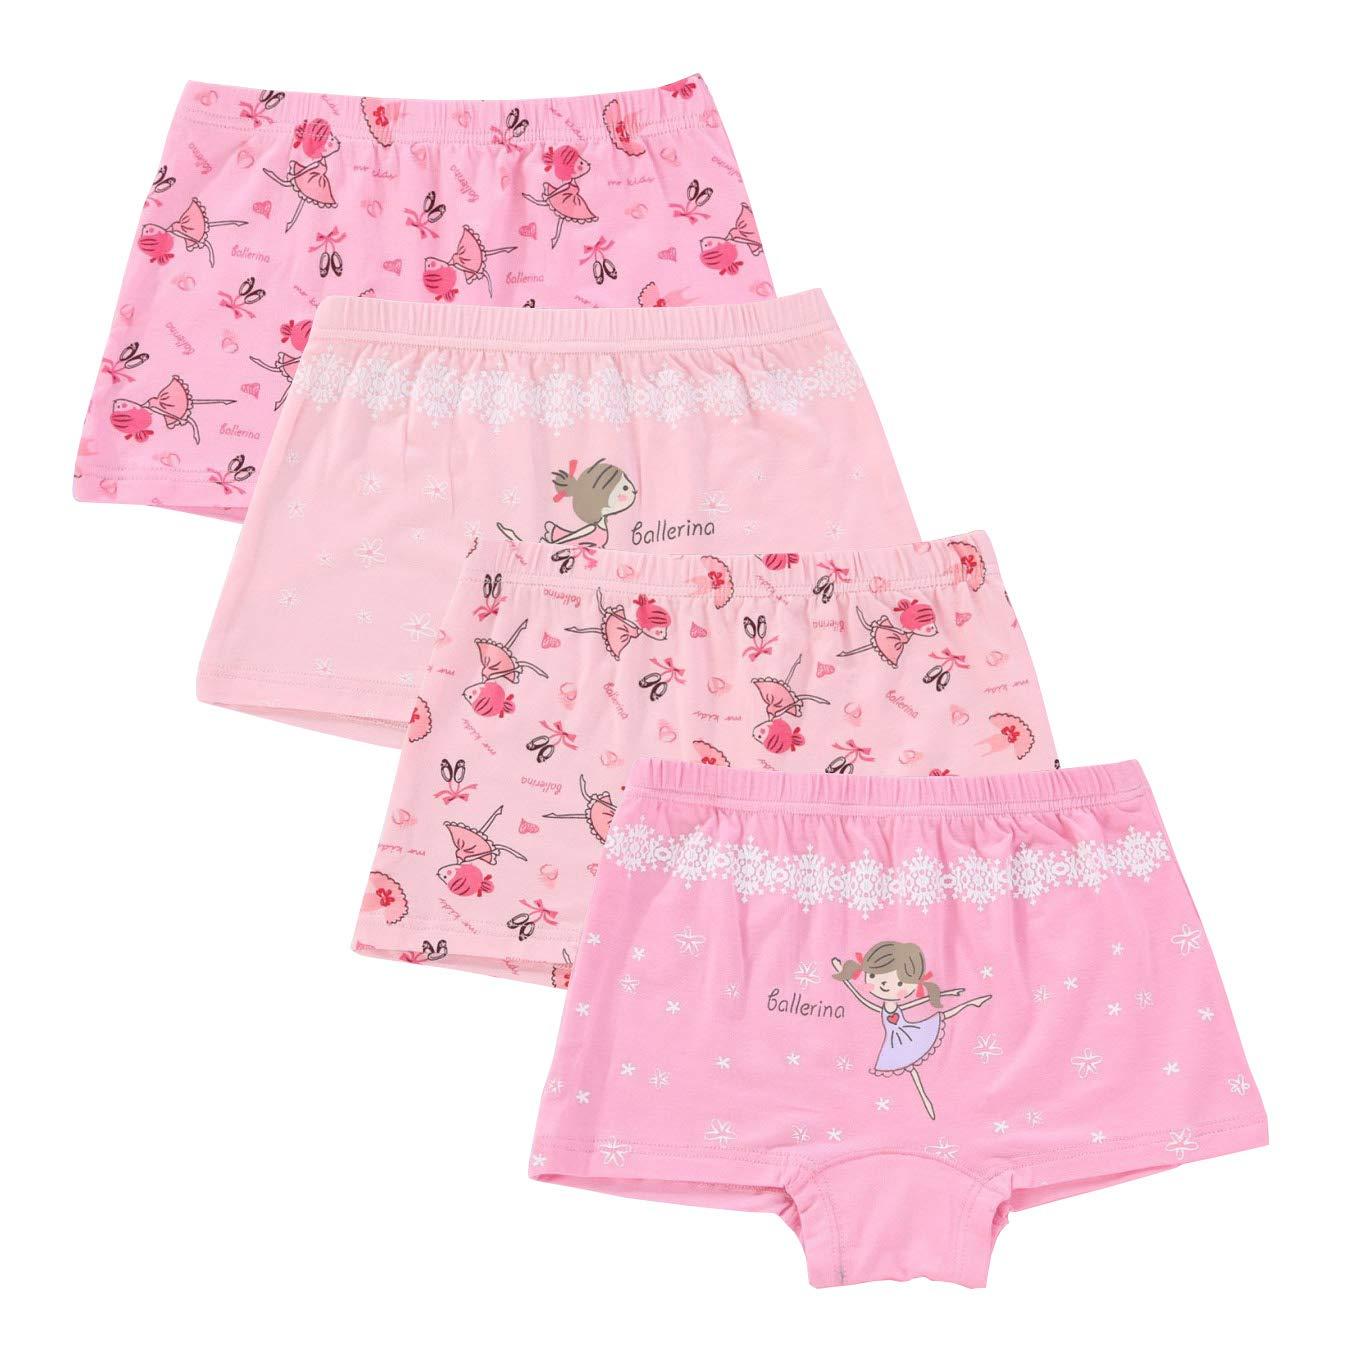 CHUNG Toddler Little Girls 95/% Cotton Panty Underwear Boyshort Brief 3-9Y Pack of 4